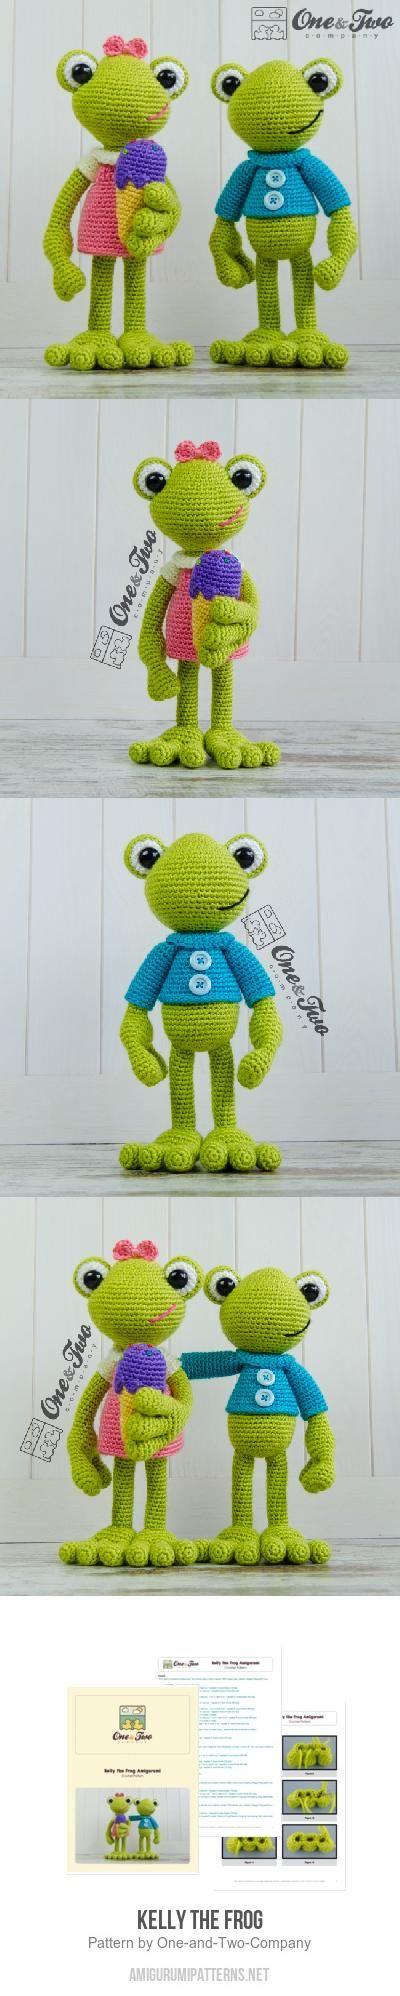 Kelly the Frog amigurumi pattern